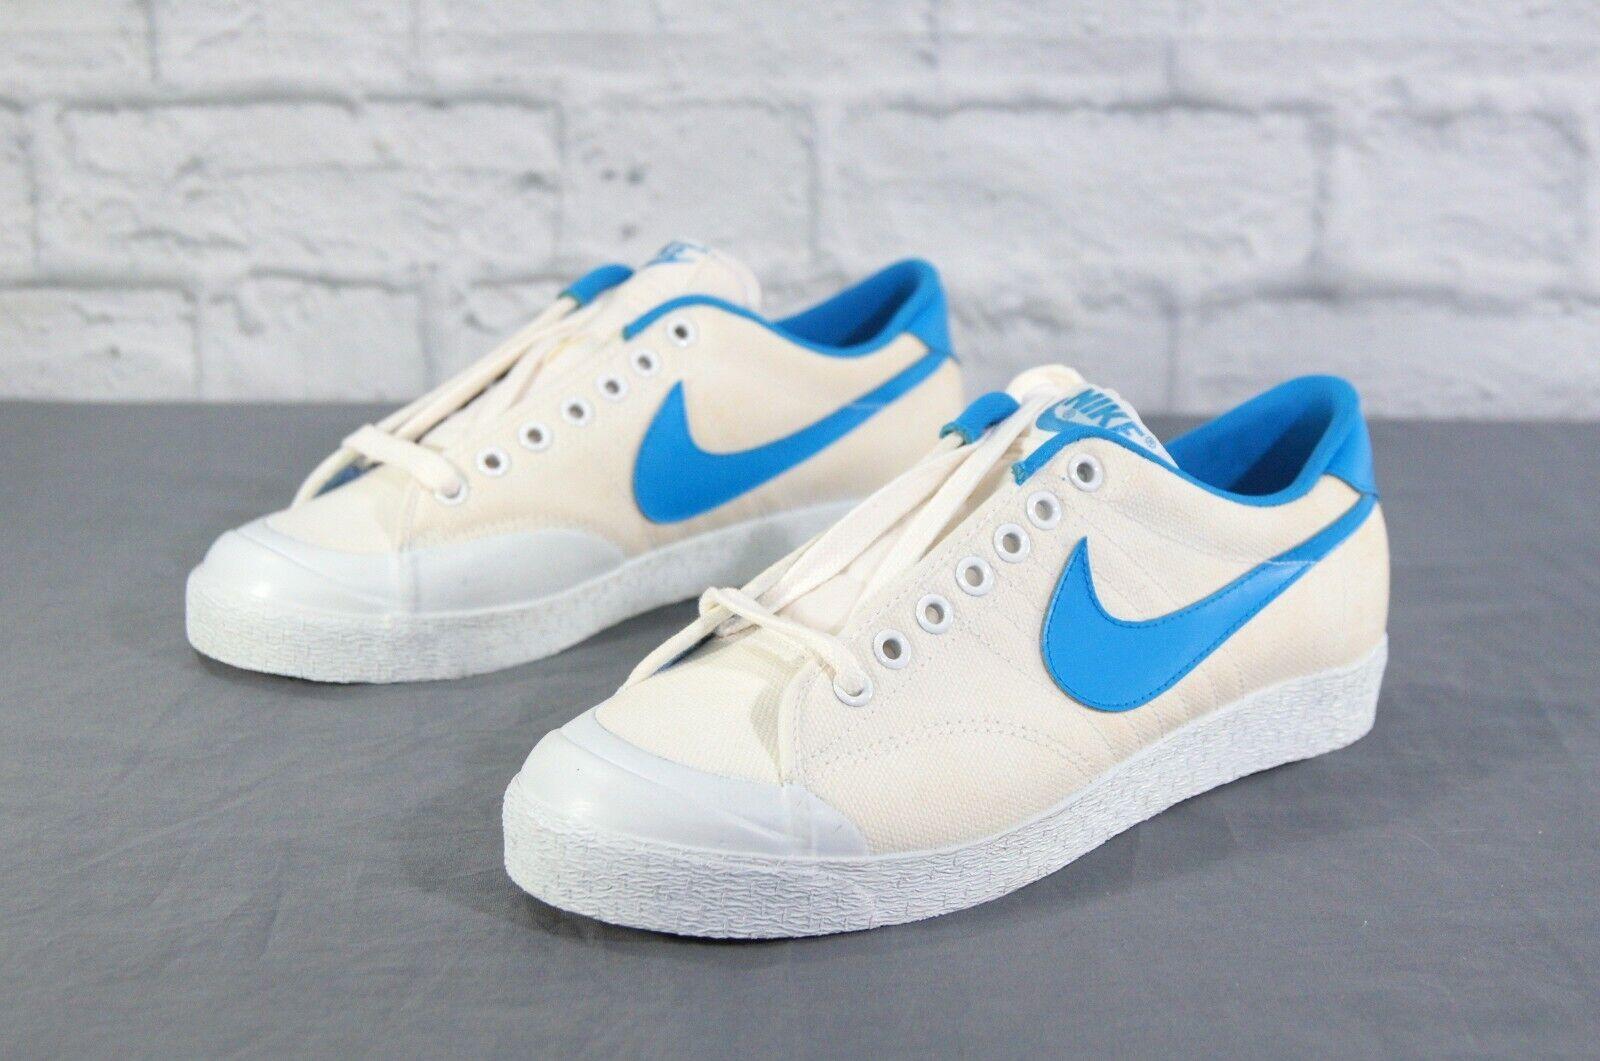 Nike 6.0 All Court Mens 8 XB Blue White